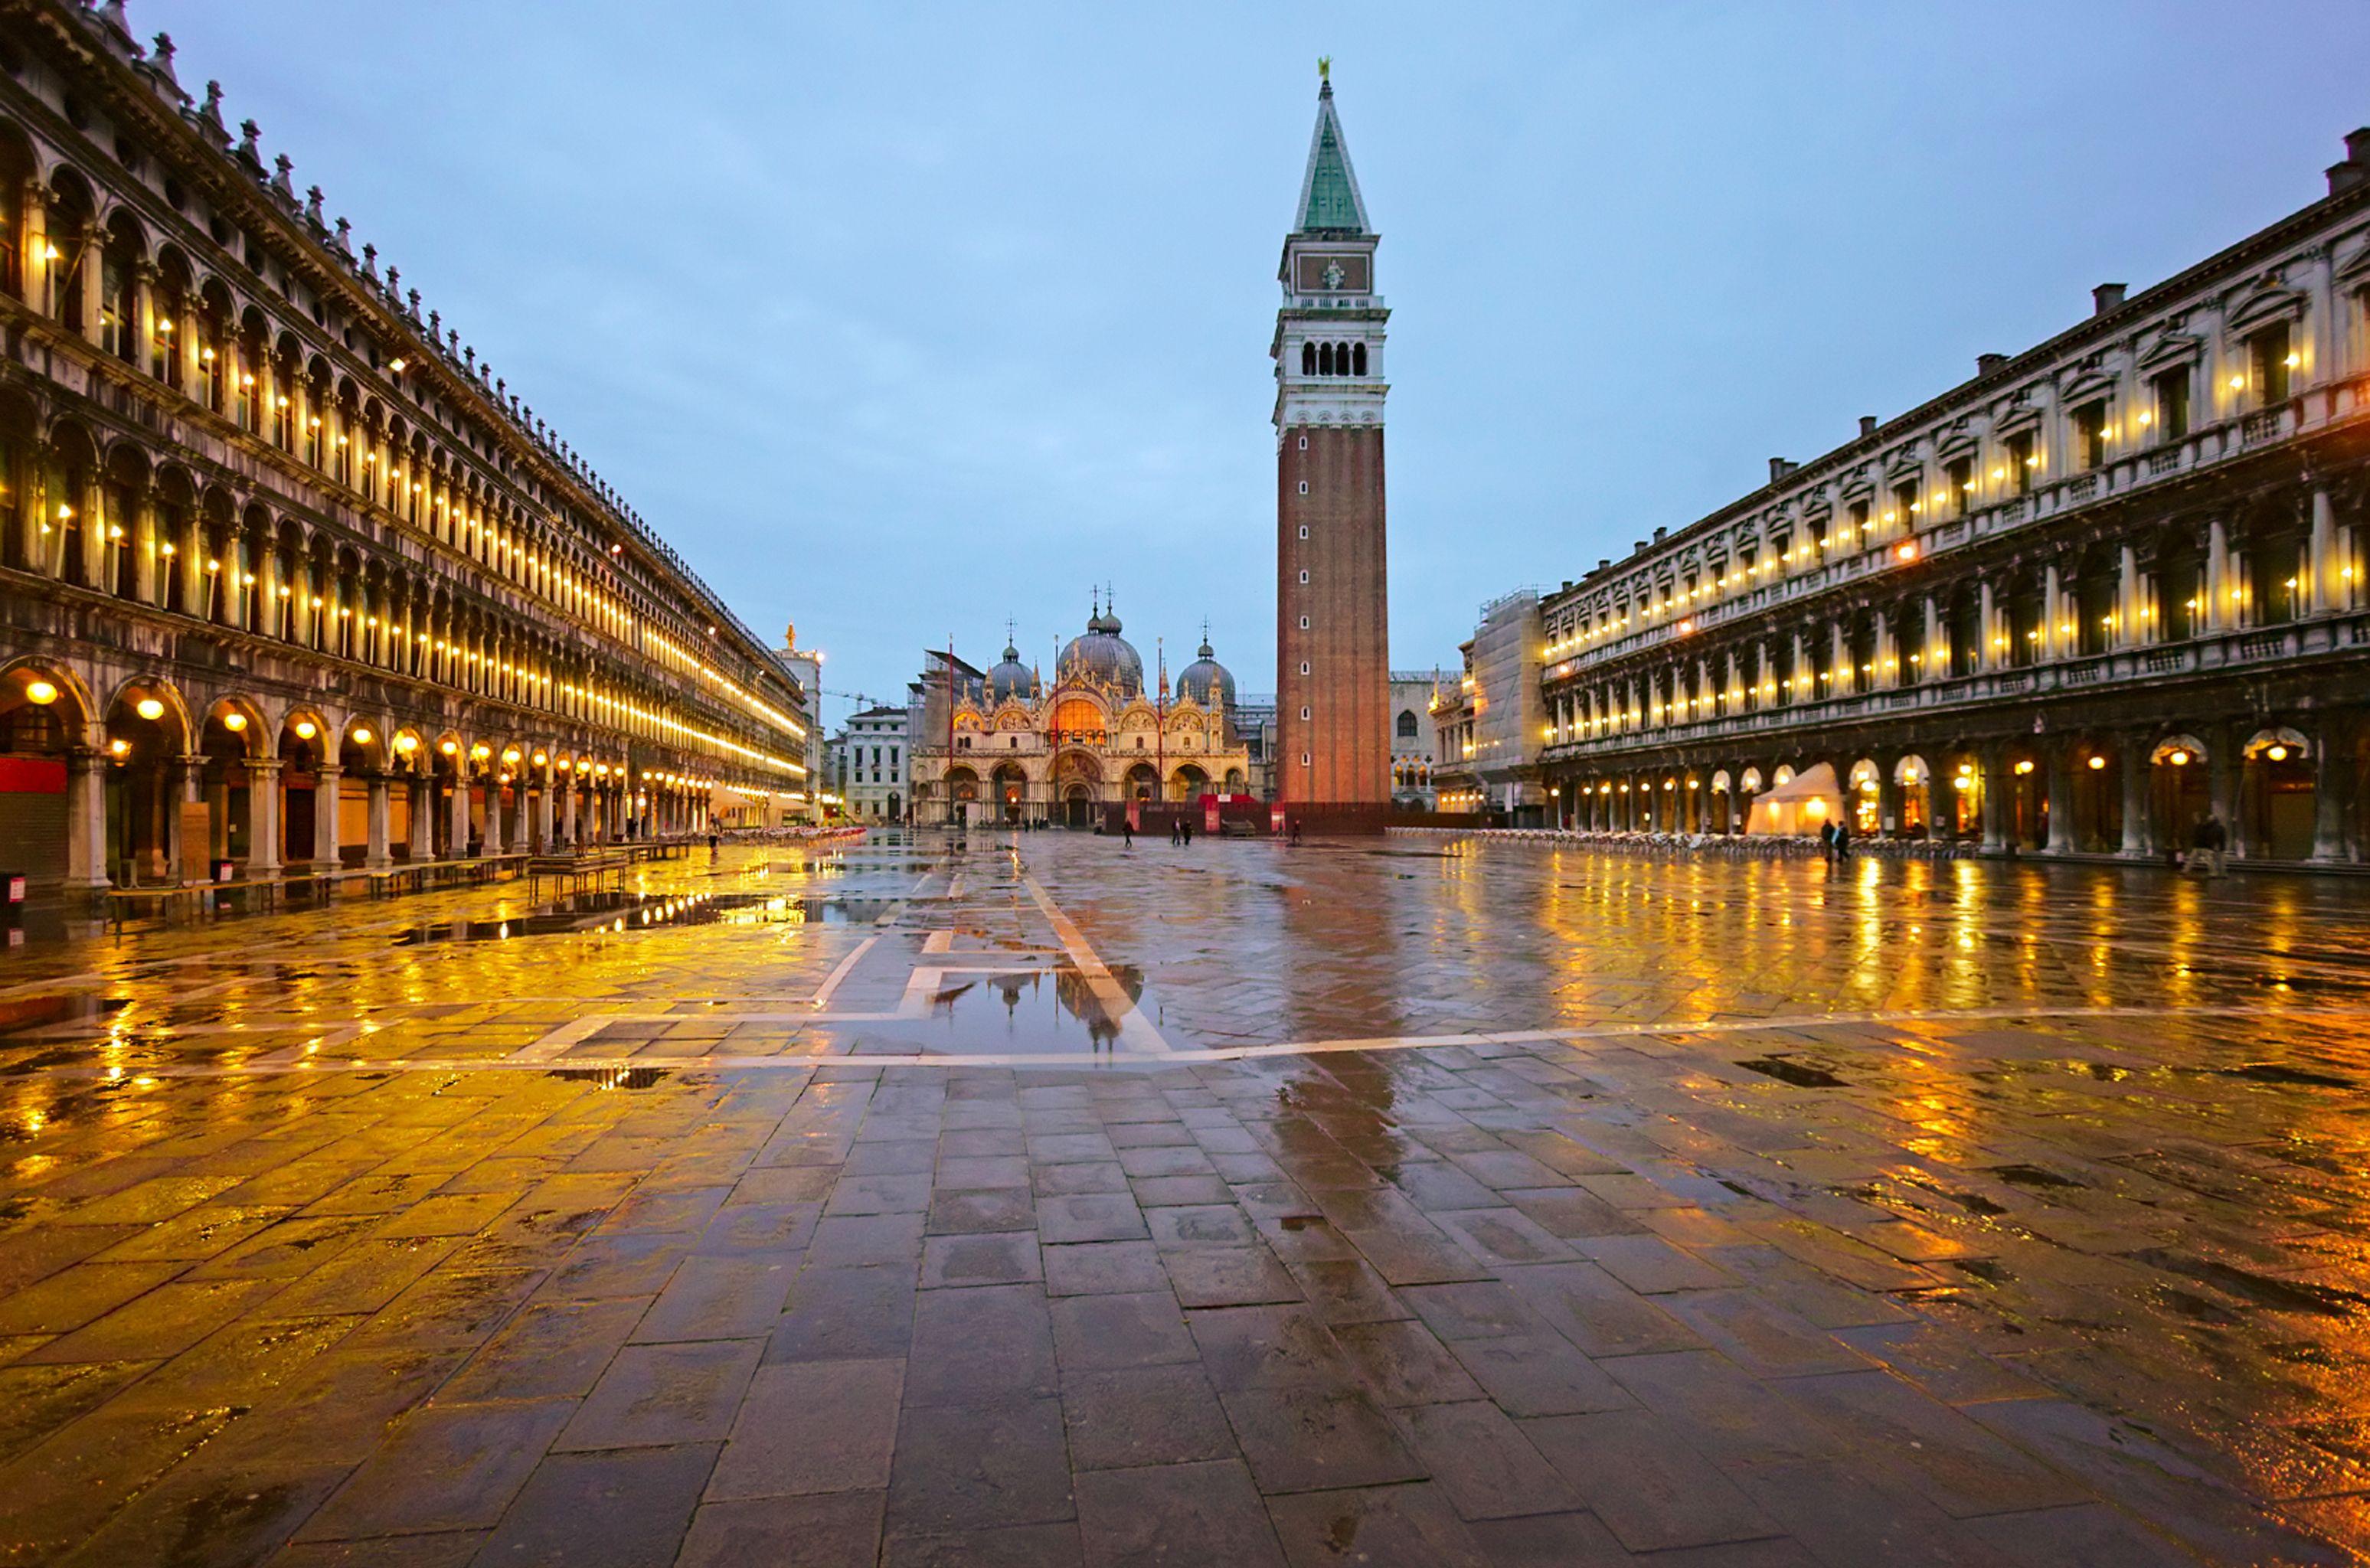 Dear Jetsetters, come visit me. Love, Venice Venice